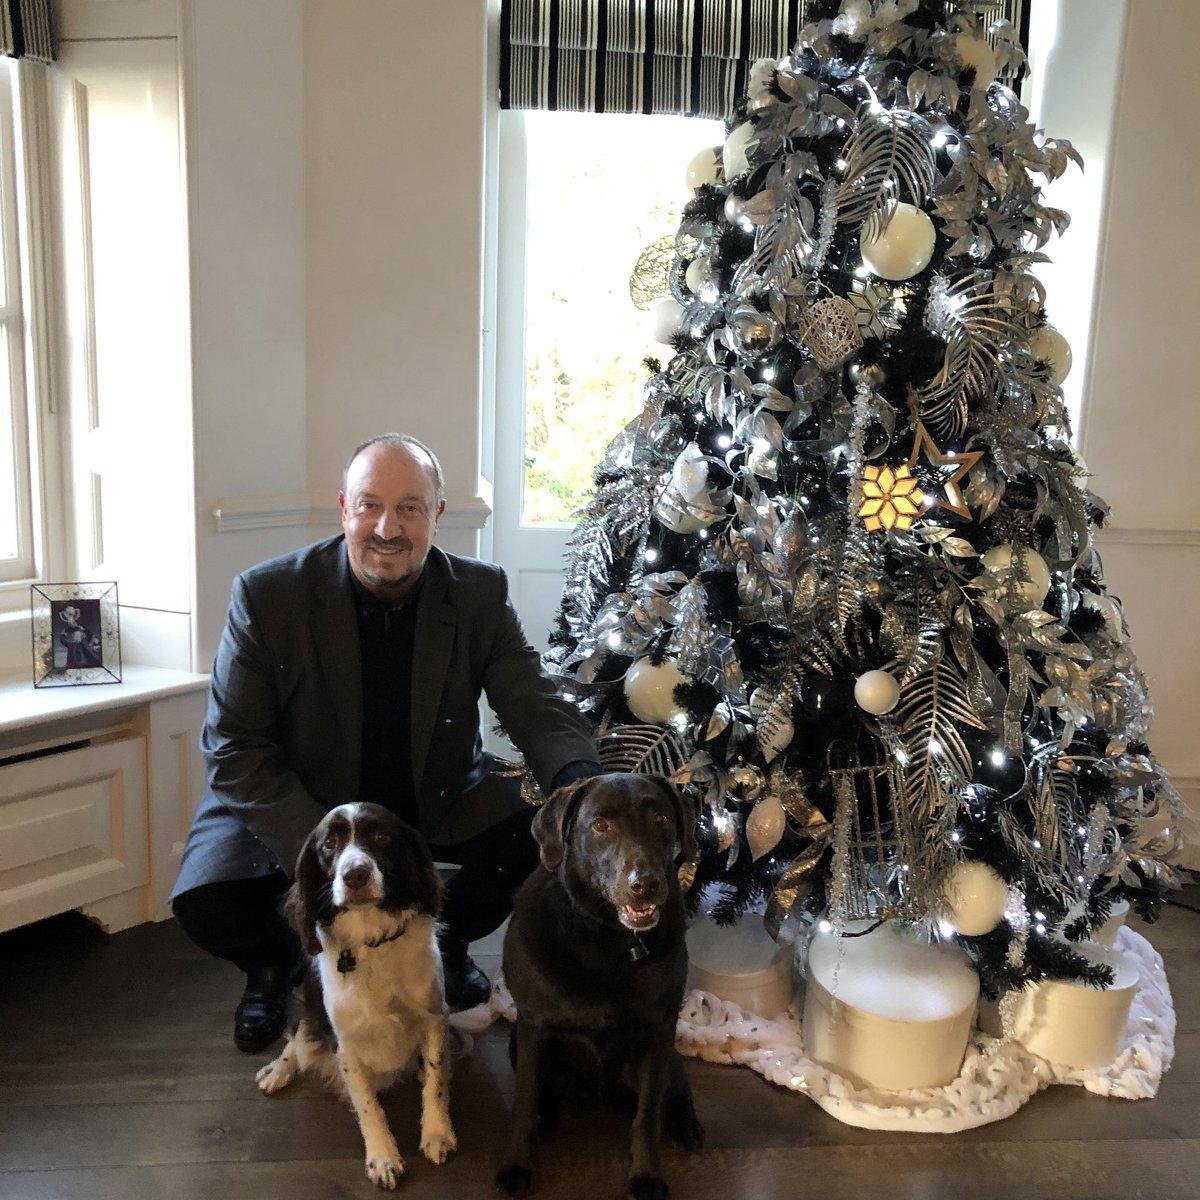 Happy holidays! It's time to enjoy with family and friends. My Best wishes.🎅🎅   Felices fiestas! Estos días son para disfrutar de la familia y amigos. Os deseo lo mejor.🎅🎅 #Christmas #holidays #Family https://t.co/YXkrz1Rwaf